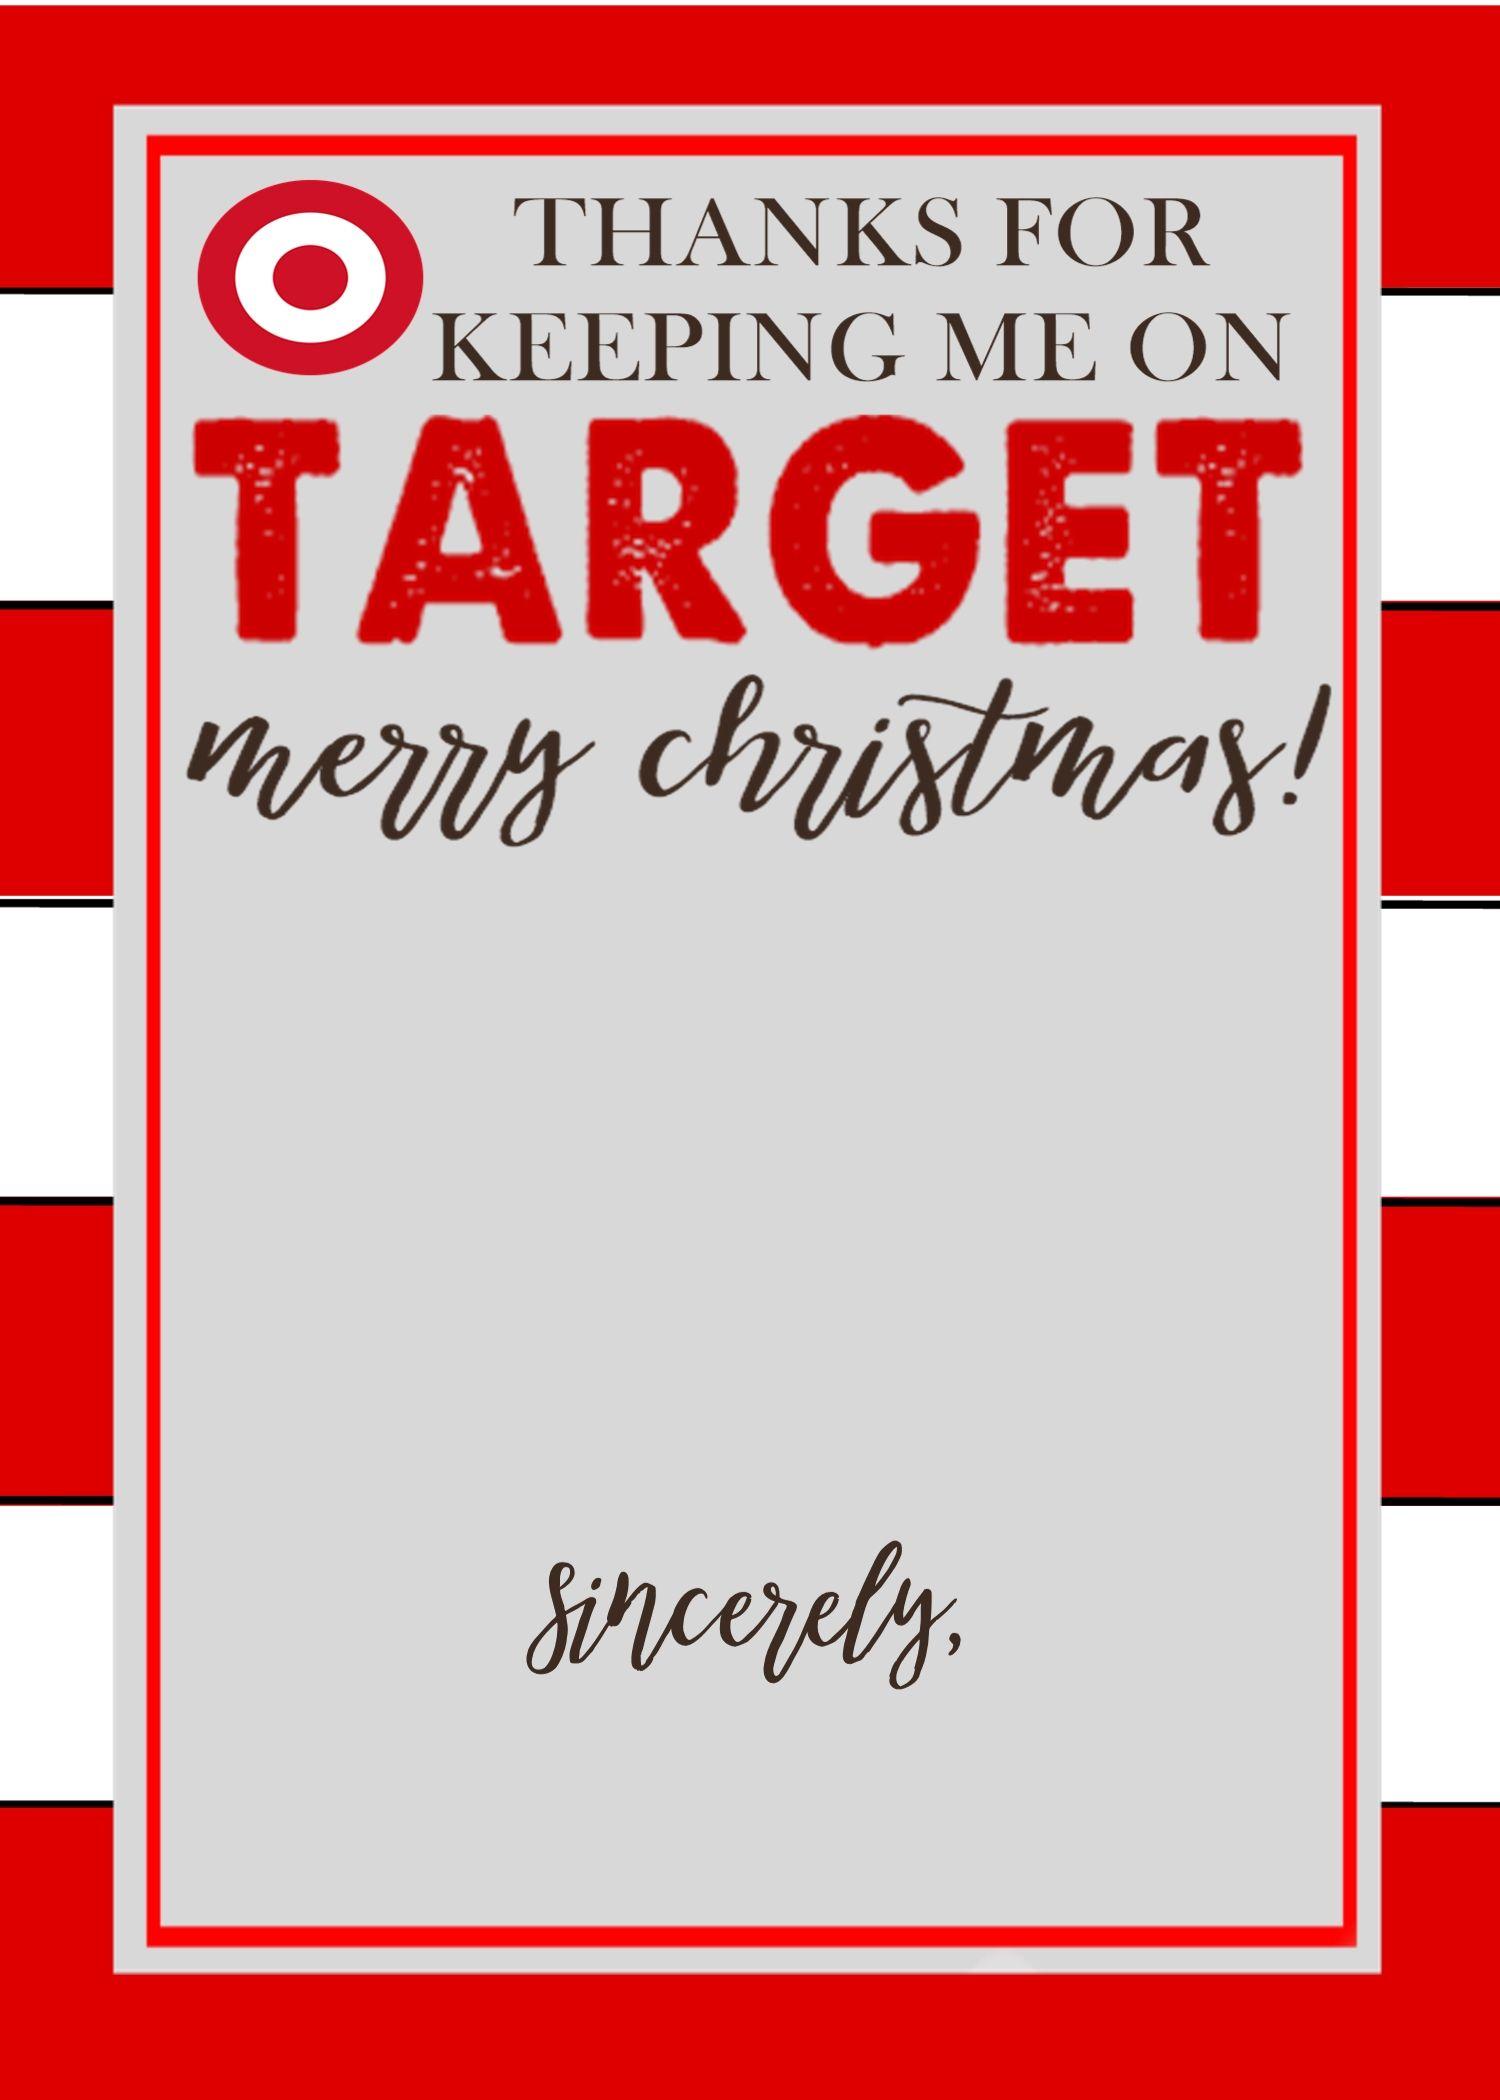 Christmas gift card holer free printables crisp